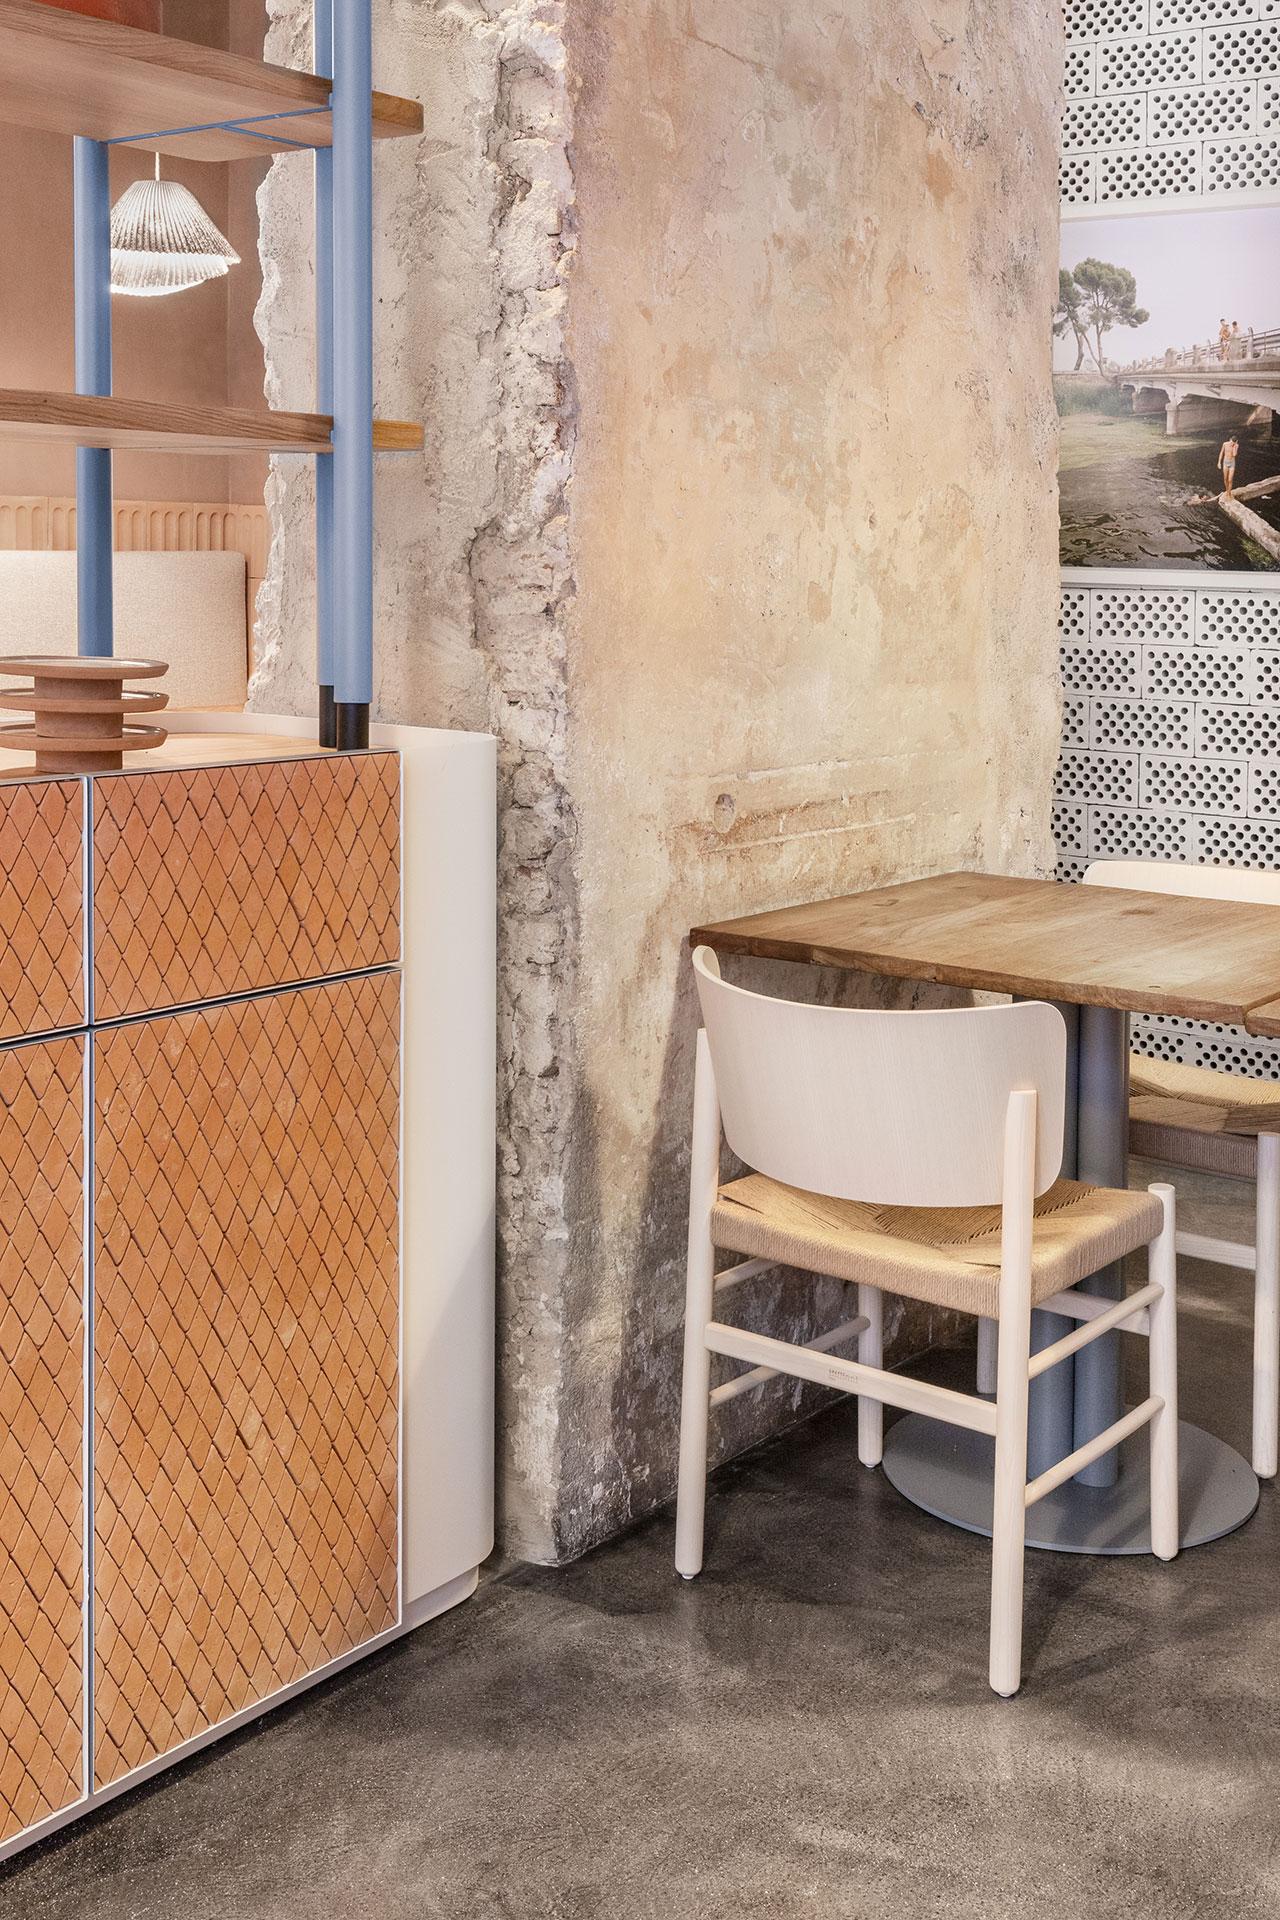 28 Posti restaurant designed byCristina Celestino.PhotoDelfino Sisto Legnani.